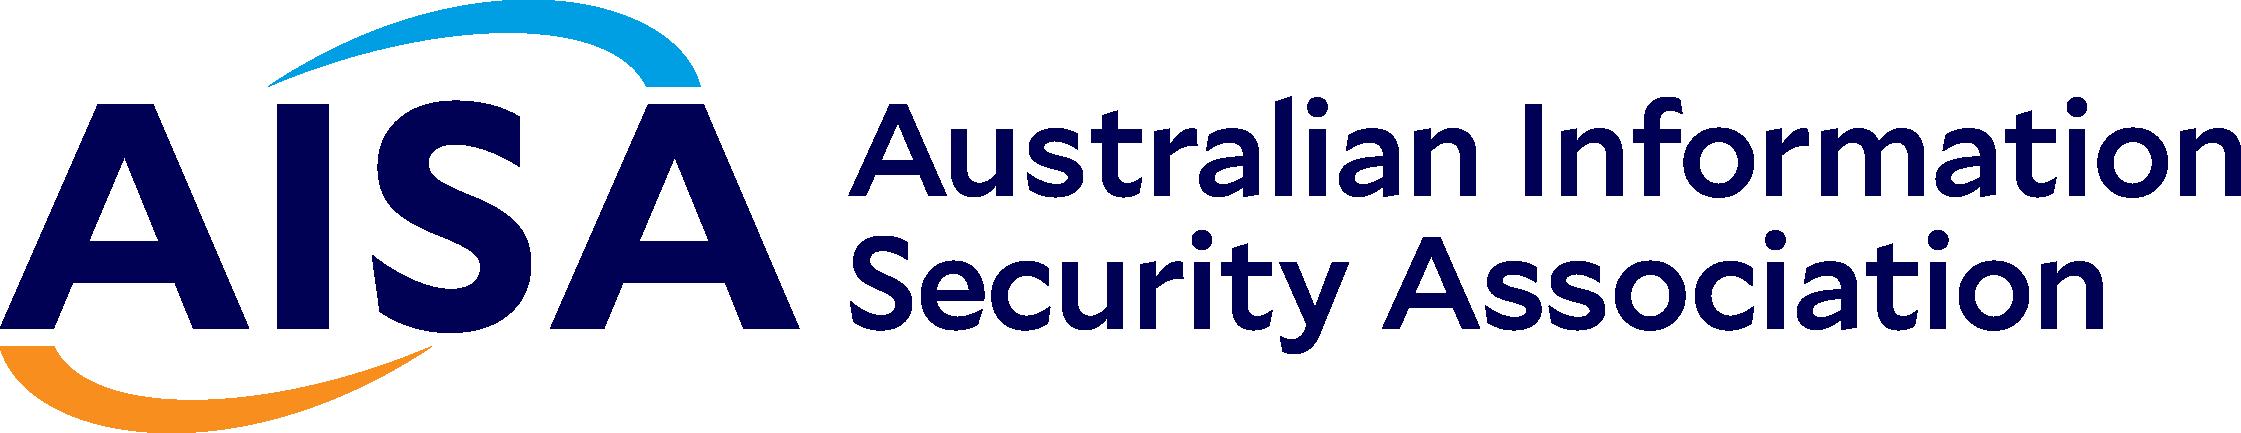 AISA(Australian Information Security Association) 로고